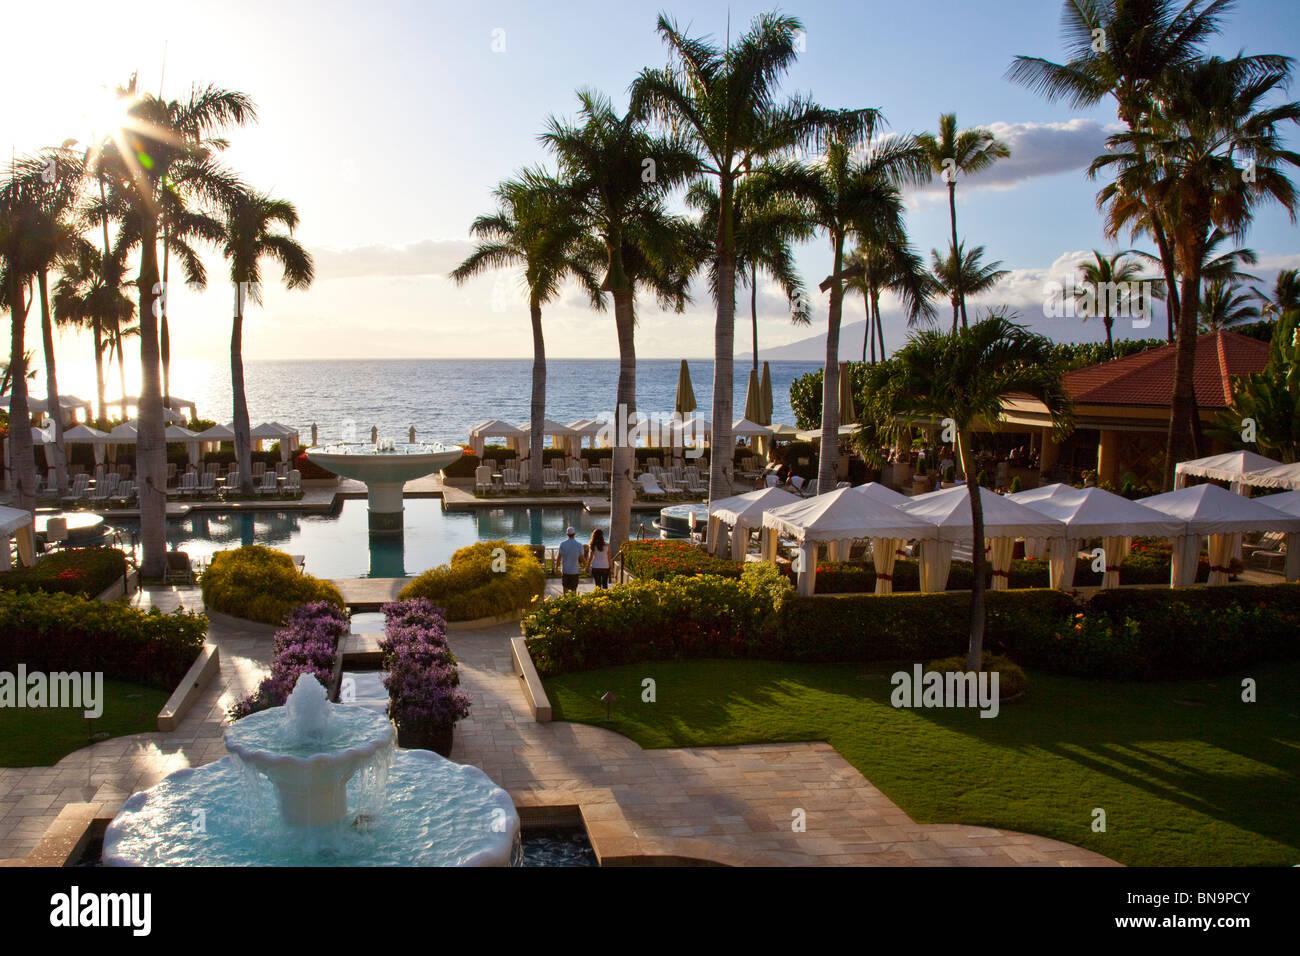 Four Seaons Resort and Hotel on Wailea Beach in Wailea, Maui, Hawaii Stock Photo